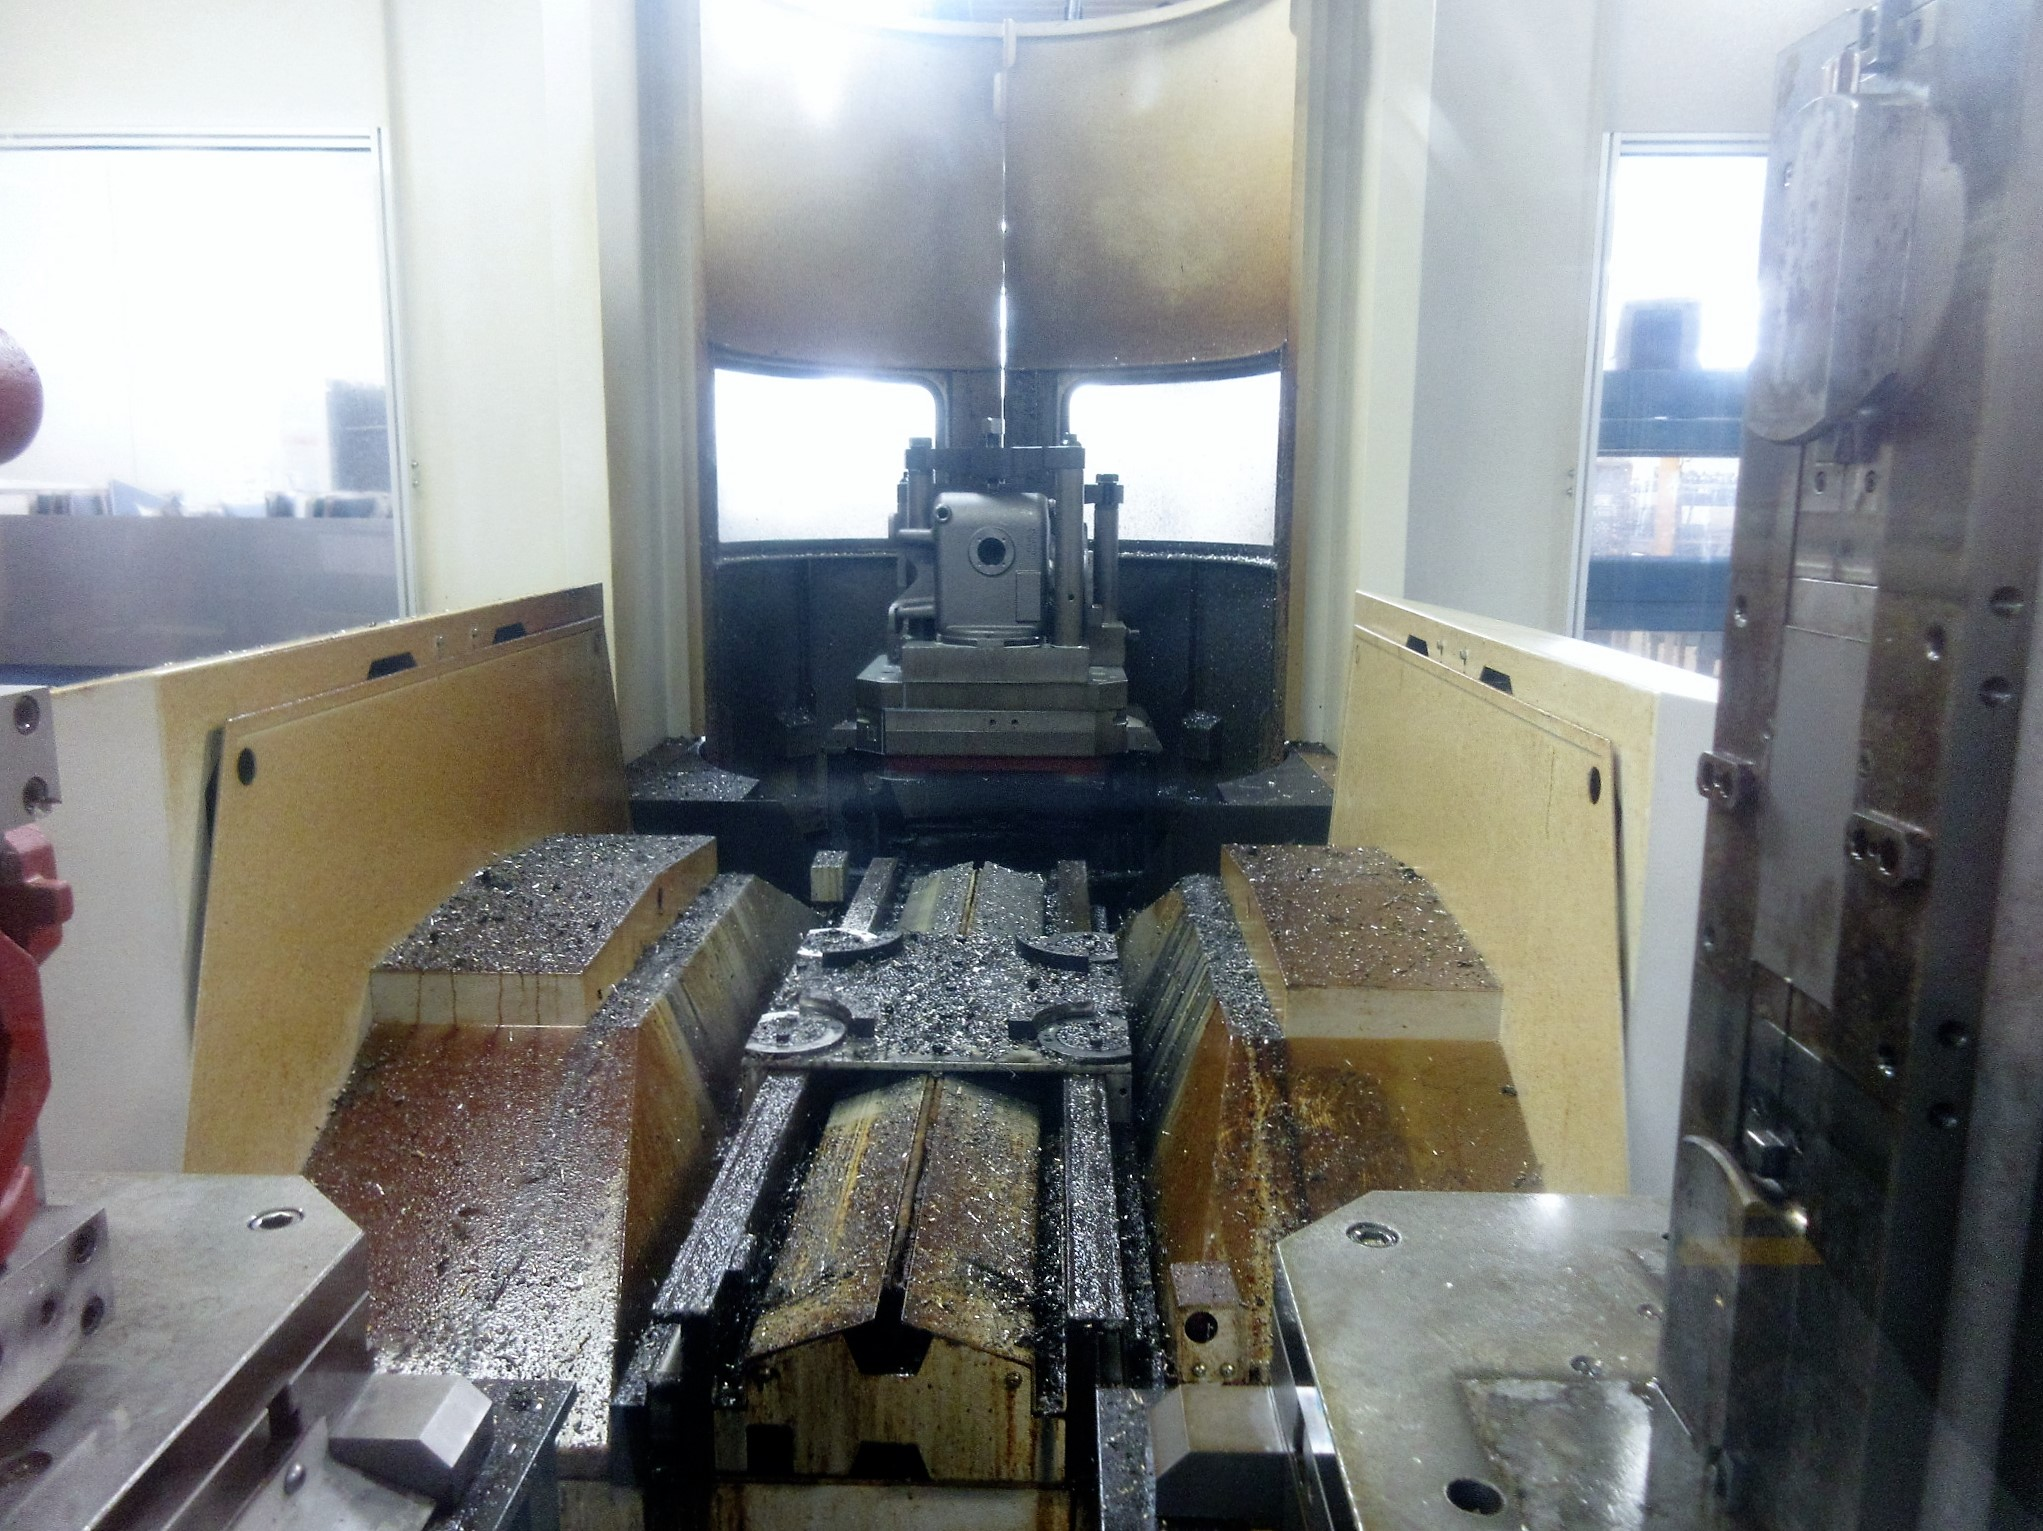 Mazak HCN-6000-II CNC Horizontal Machining Center With Palletech System - Image 12 of 22